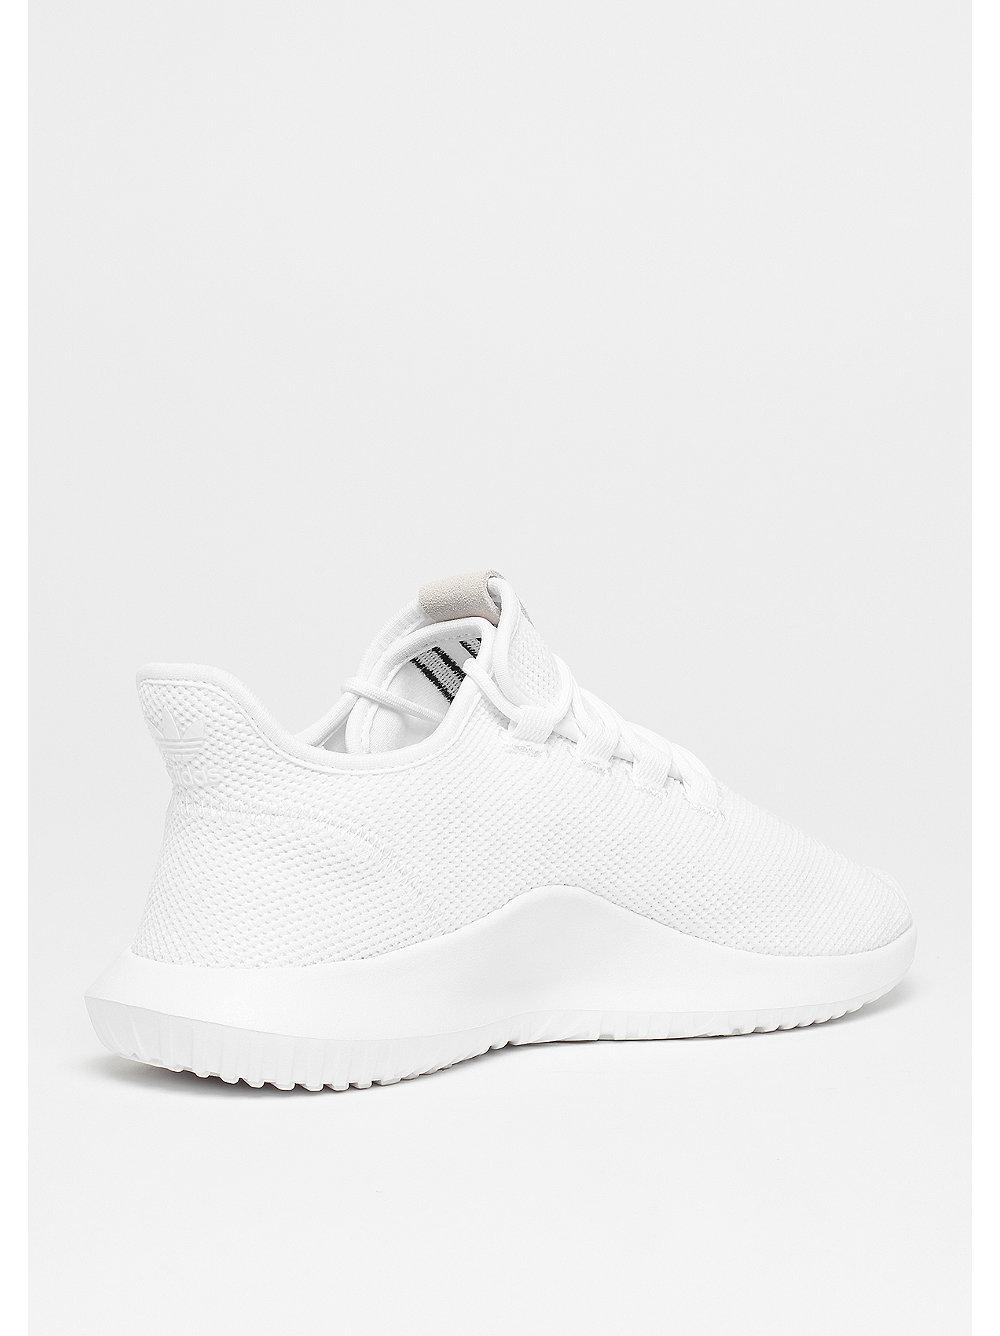 21de7d7ffd3e adidas Tubular Shadow white en la tienda online de SNIPES